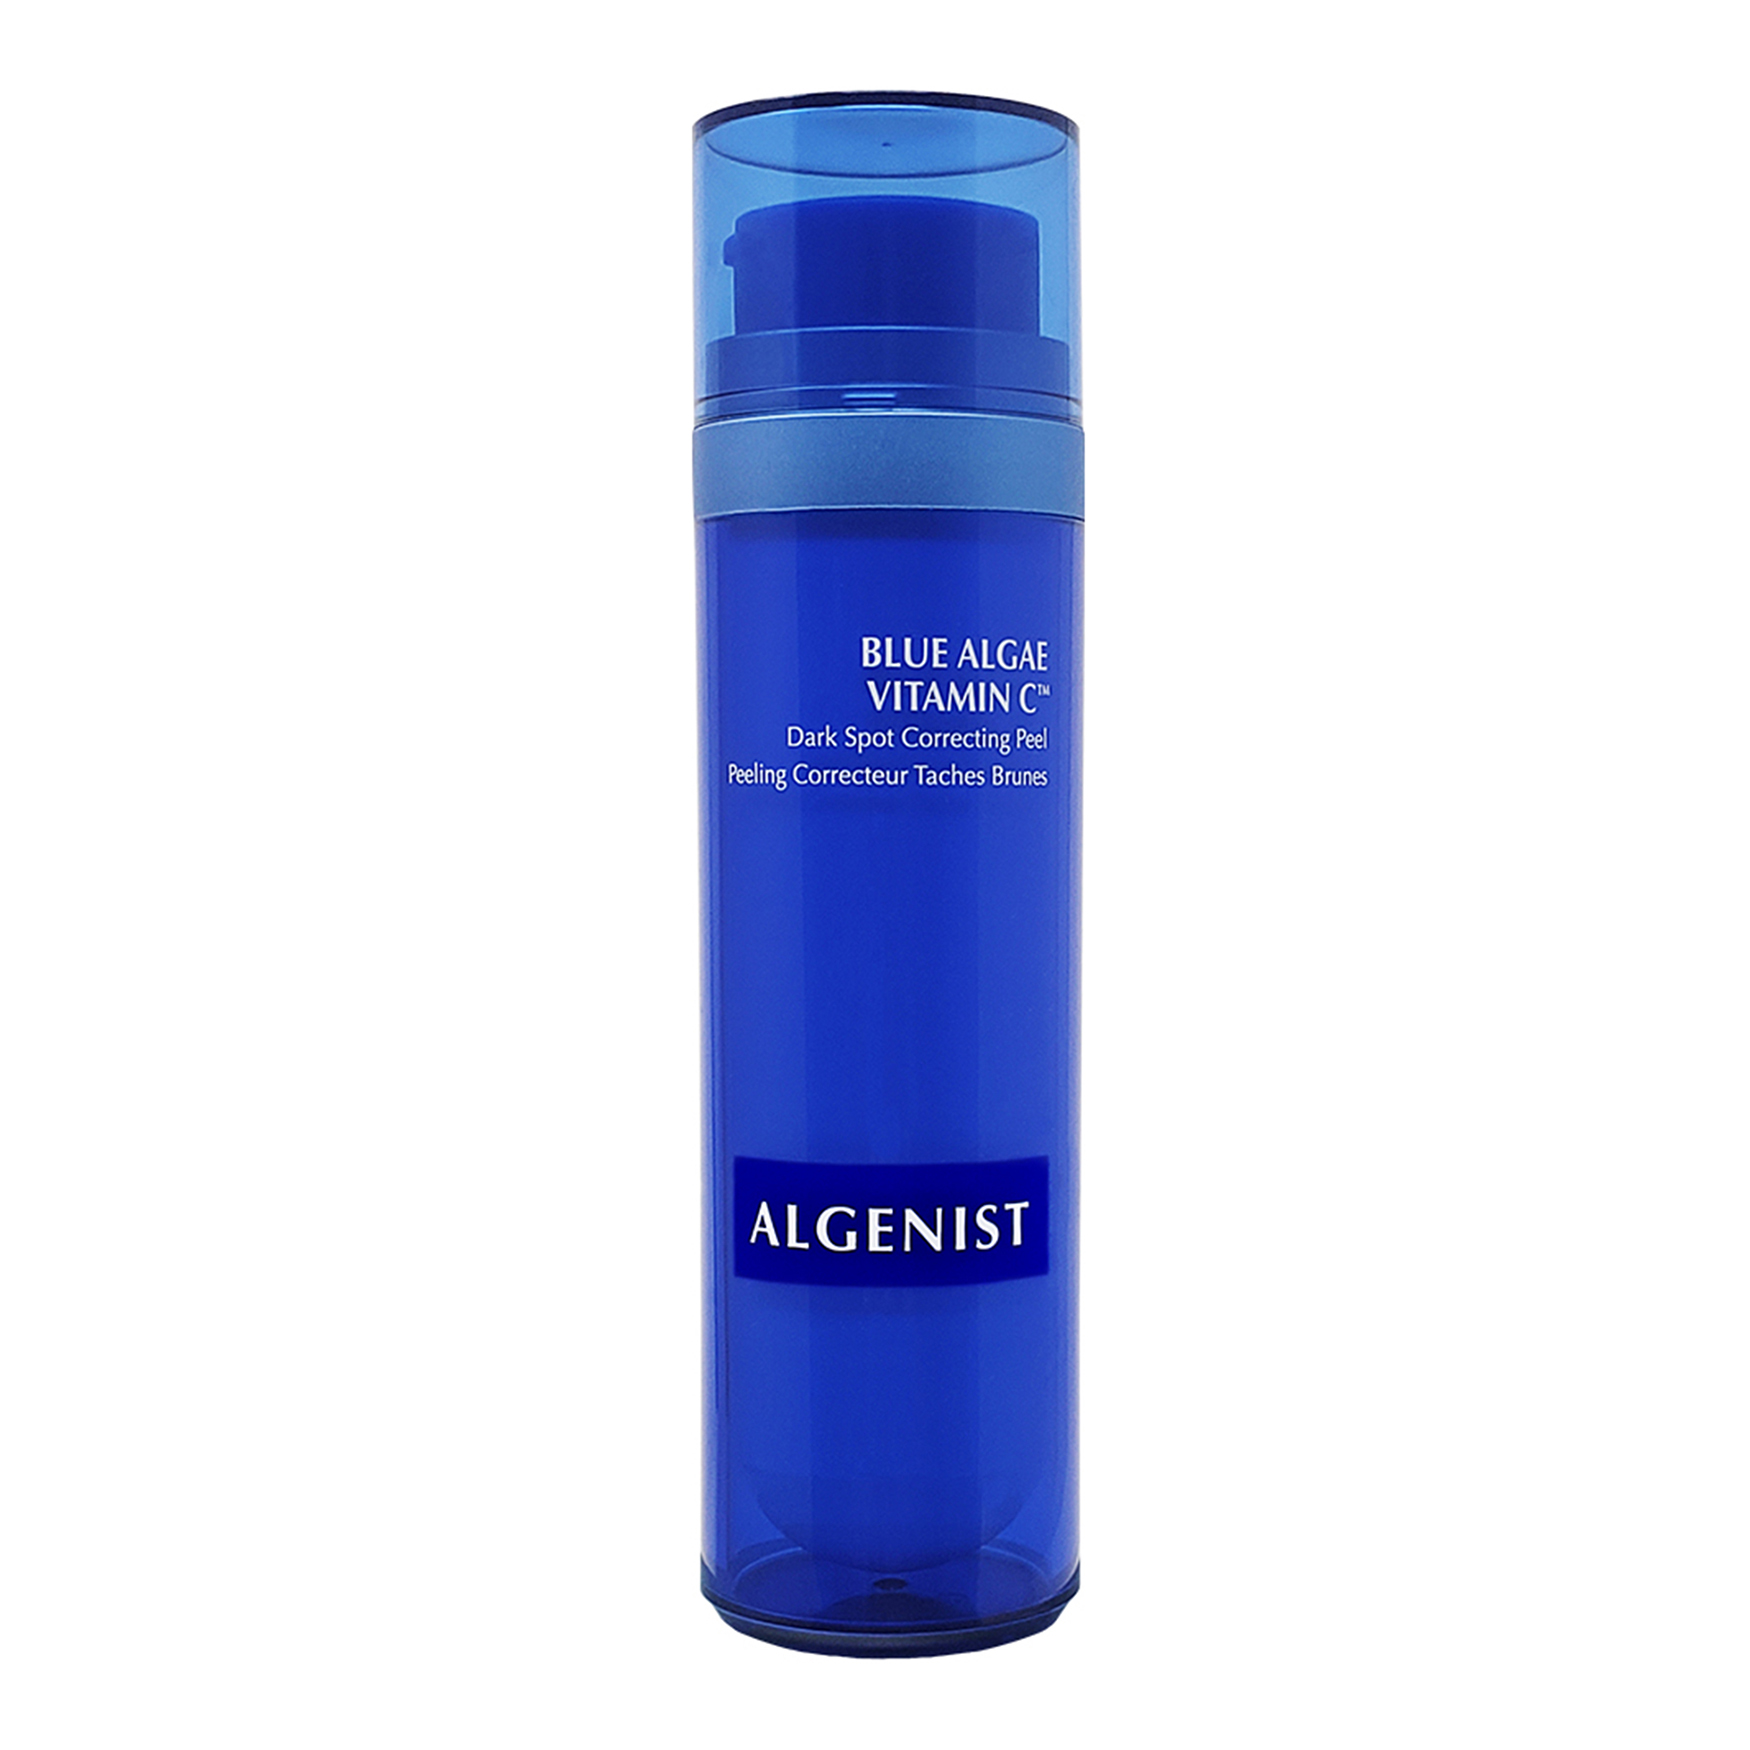 Blue Algae Vitamin C Dark Spot Correcting Peel, , large